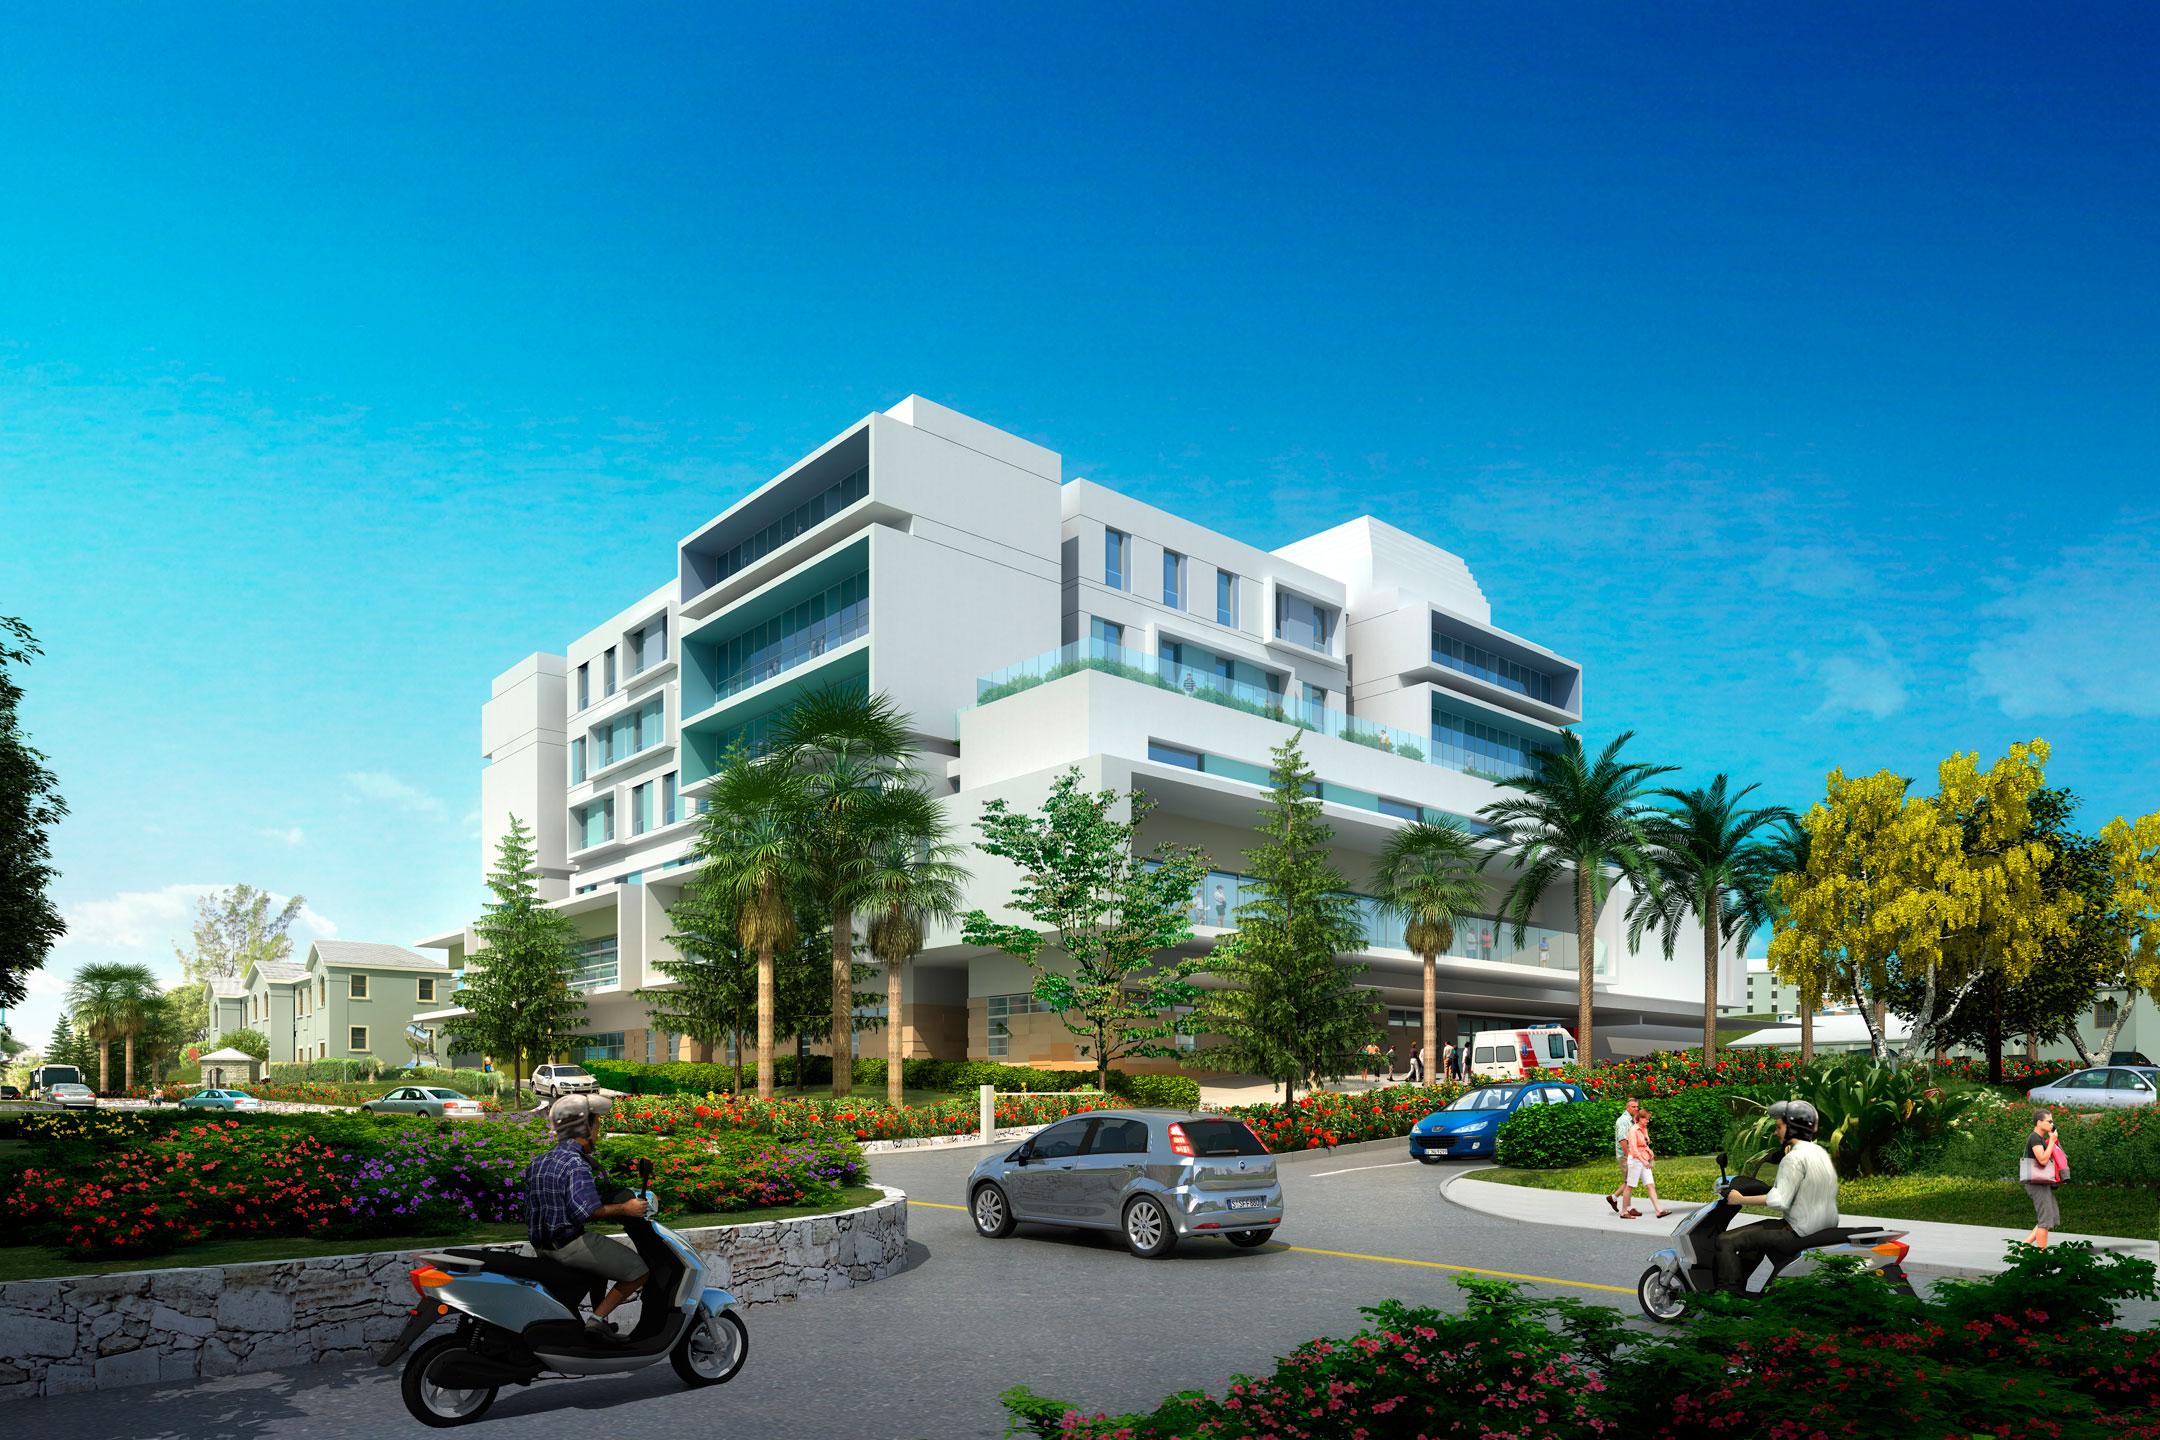 King Edward Memorial Hospital - Streetview